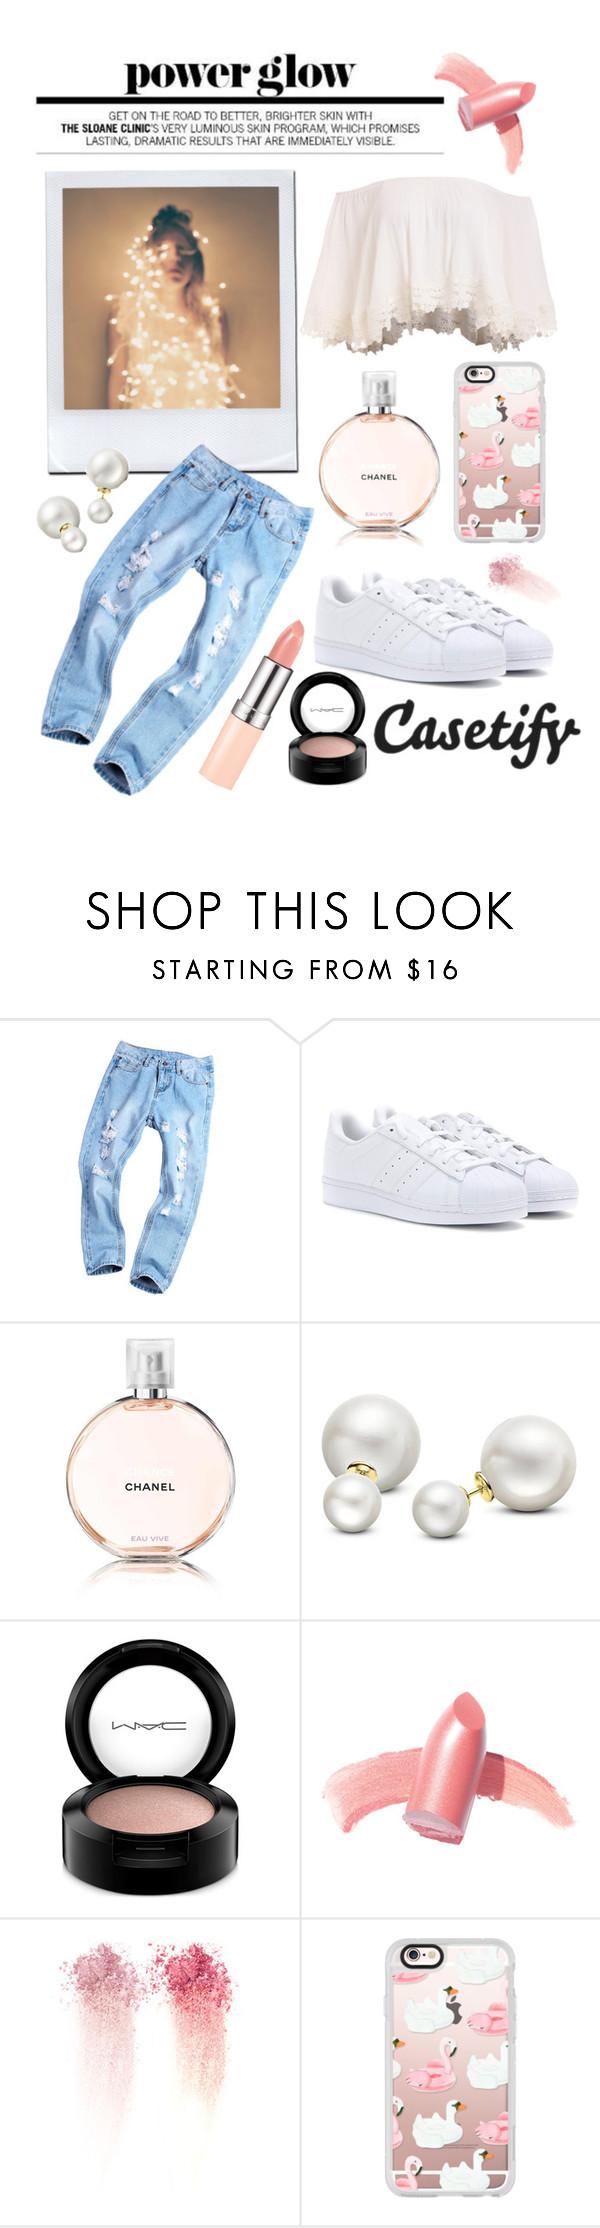 """shades of elegance"" by lialicious on Polyvore featuring adidas, Chanel, Allurez, MAC Cosmetics, Elizabeth Arden, NARS Cosmetics and Casetify"